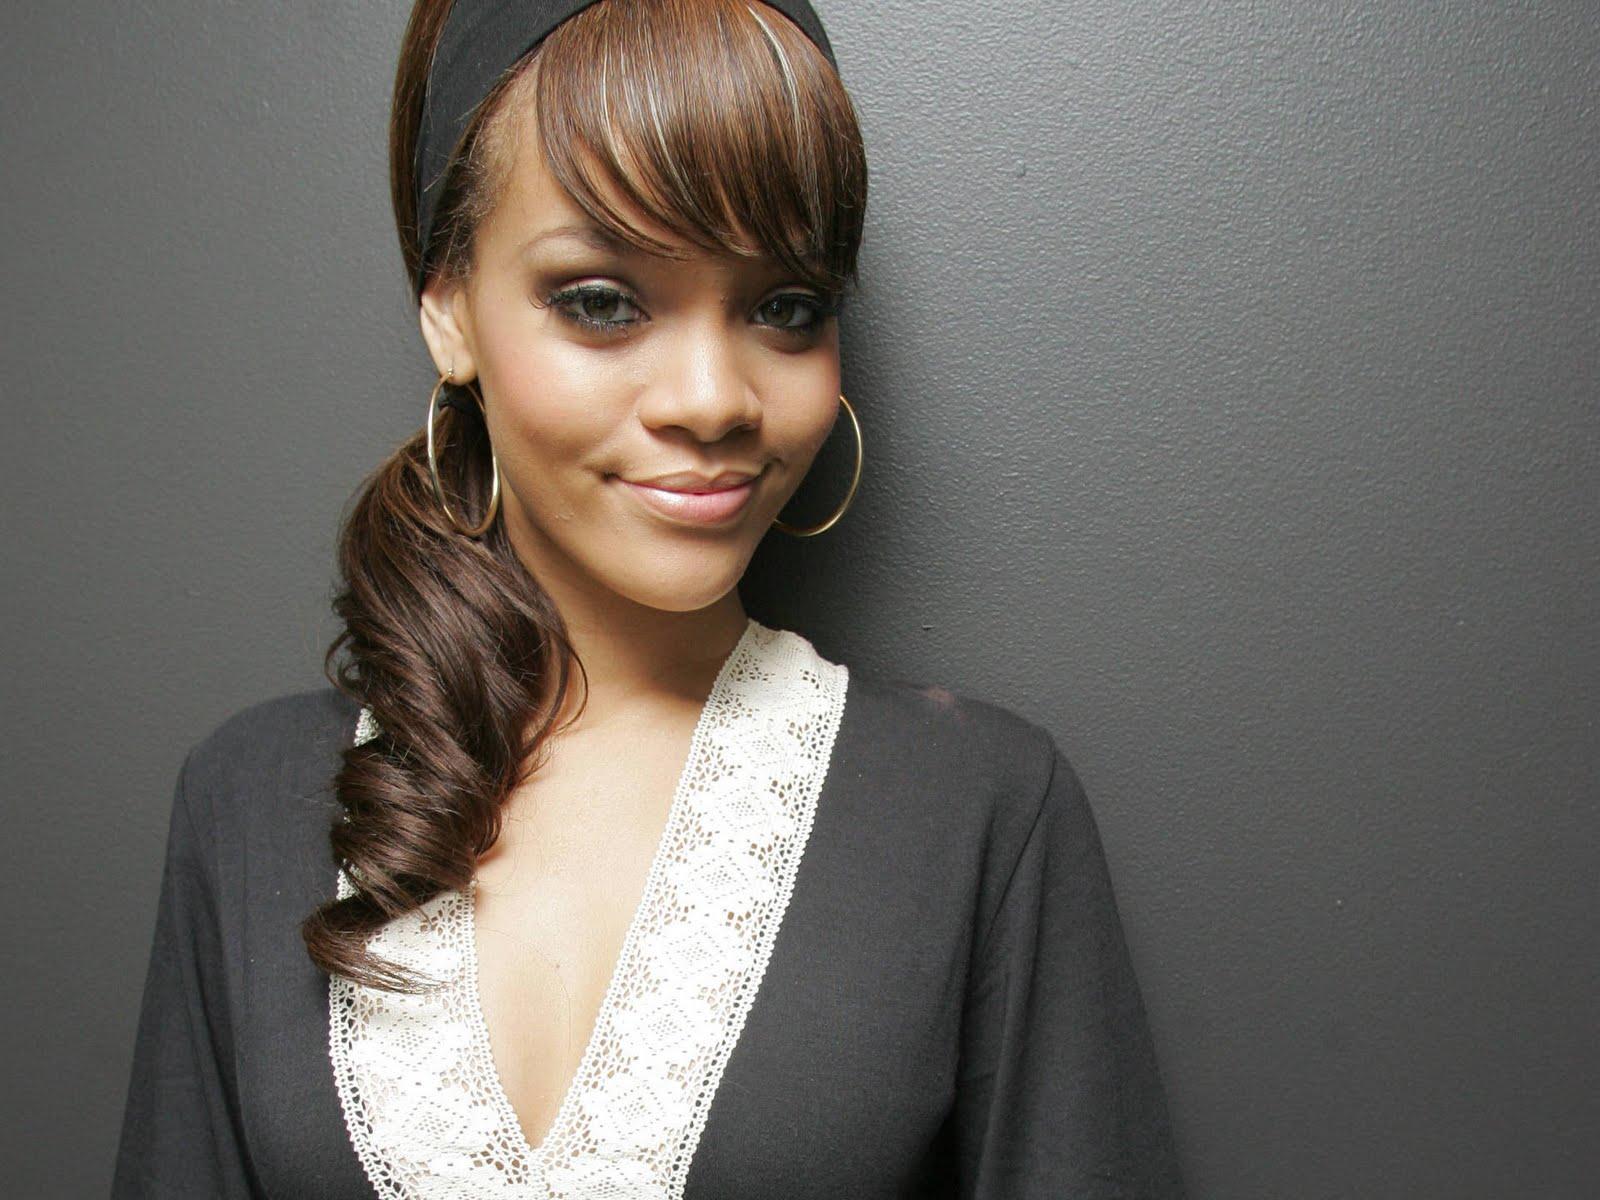 http://4.bp.blogspot.com/-LDPxqrfqtmc/TpP1guywPnI/AAAAAAAAIVA/v0pIi91ntIM/s1600/Rihanna.jpg